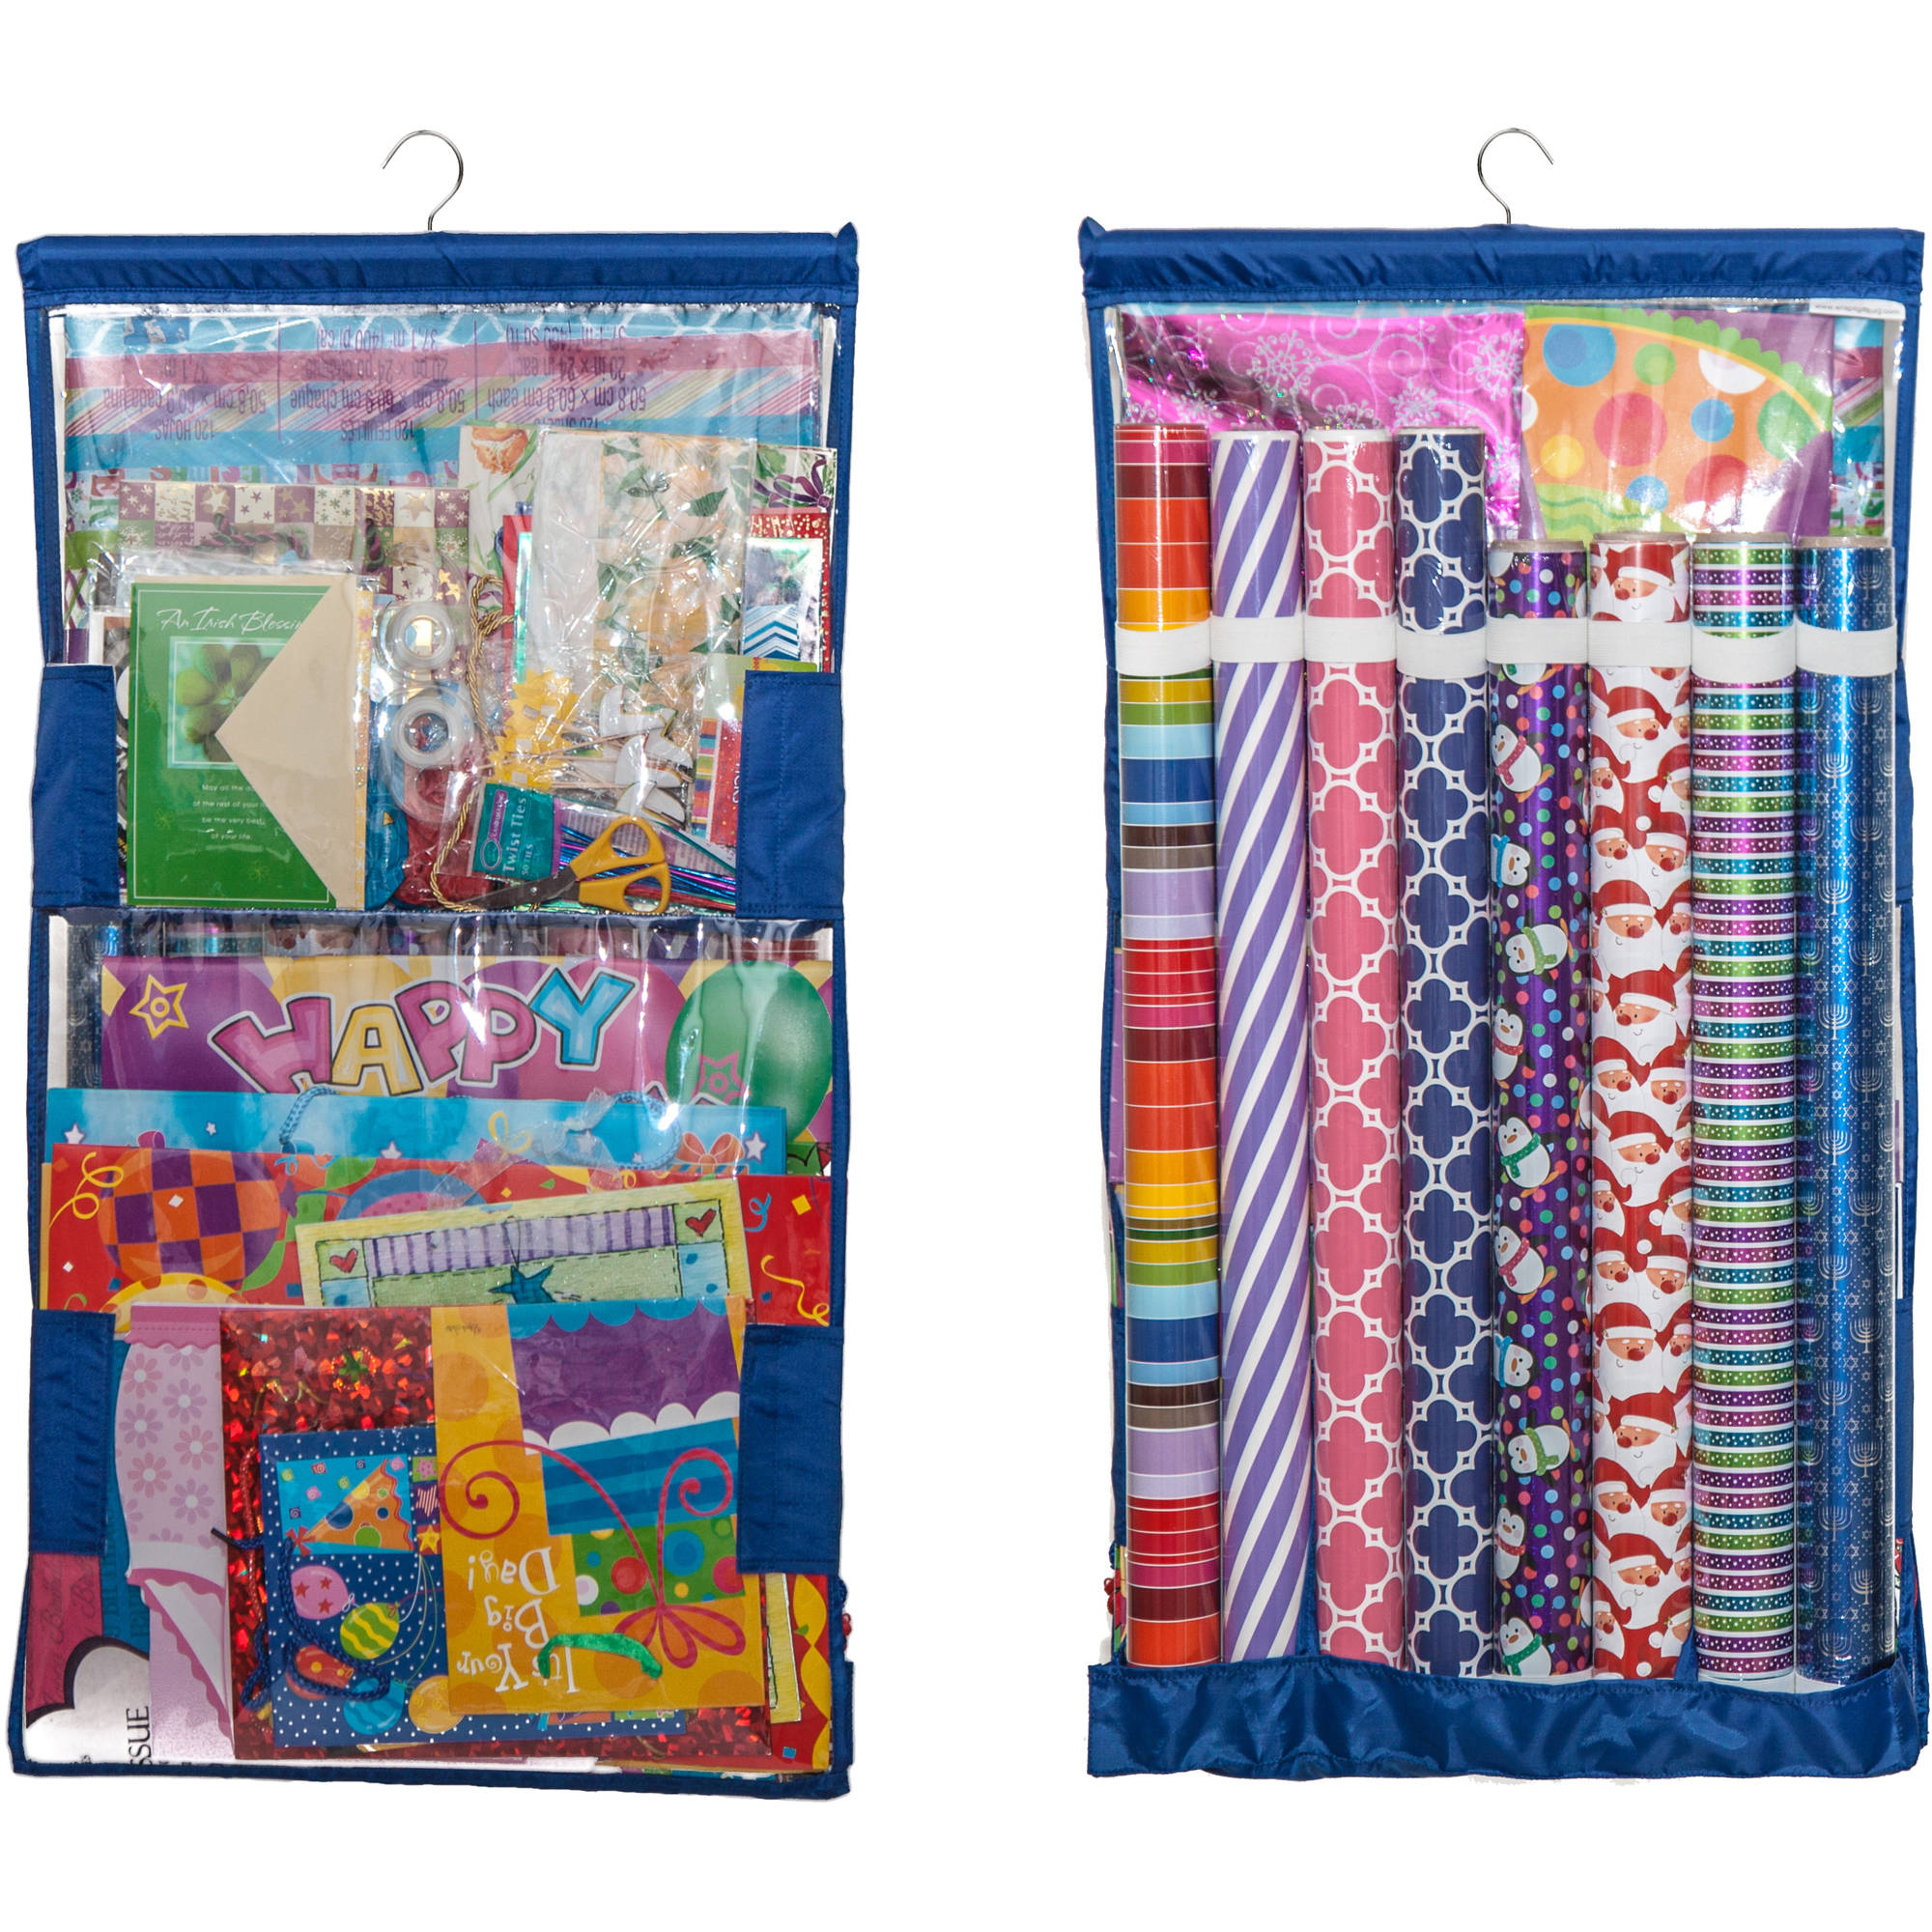 Wrap iT Buddy Gift Wrap Storage Organizer, Vertical Hanging ...